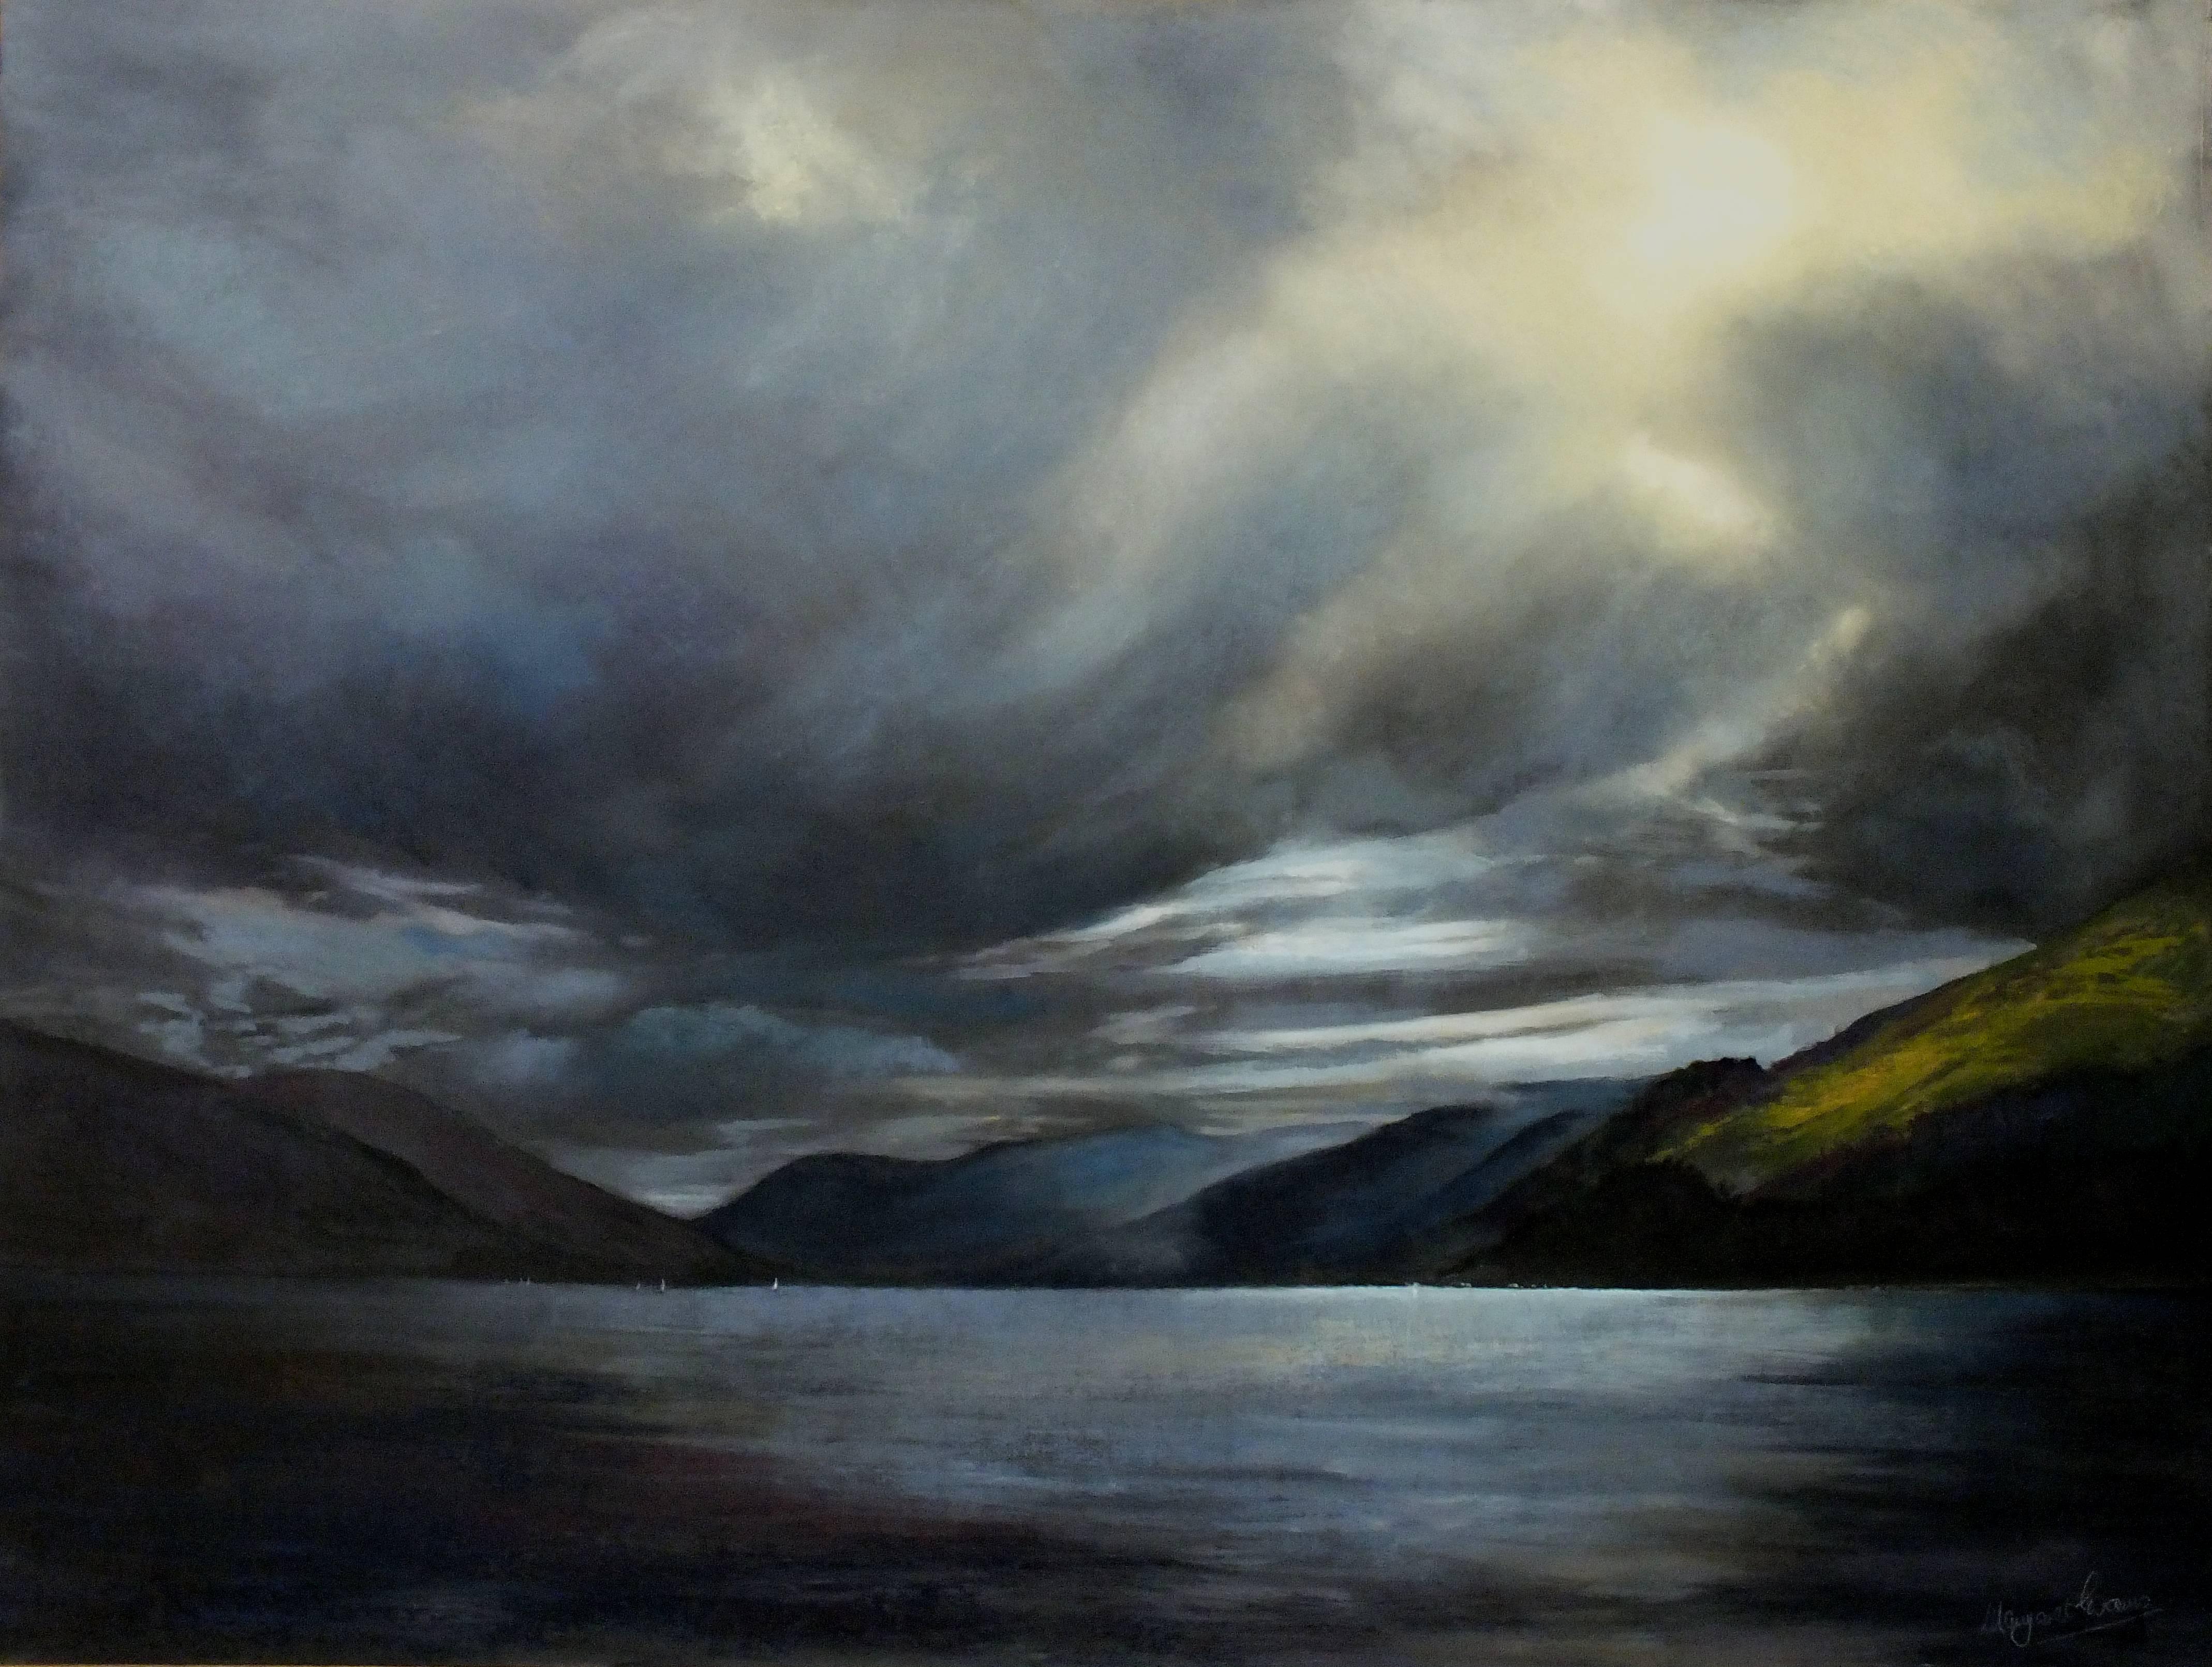 Margaret Evans_Moonlight on the Loch_Pastel & Gouache_36x48